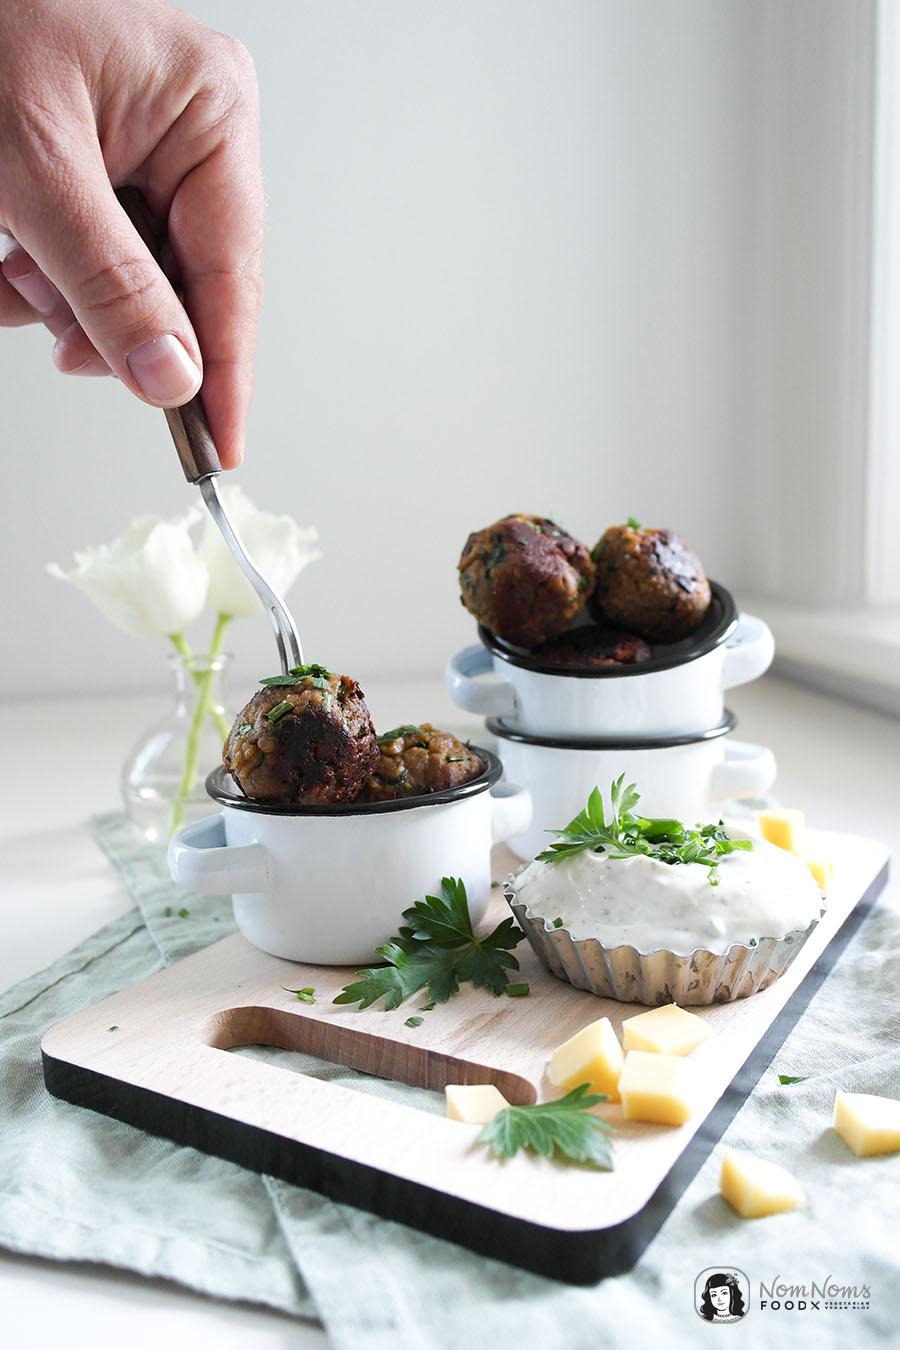 Vegetarische Frühlingskräuter-Käse-Mini-Frikadellen mit frischem Frühlingskräuter-Dip